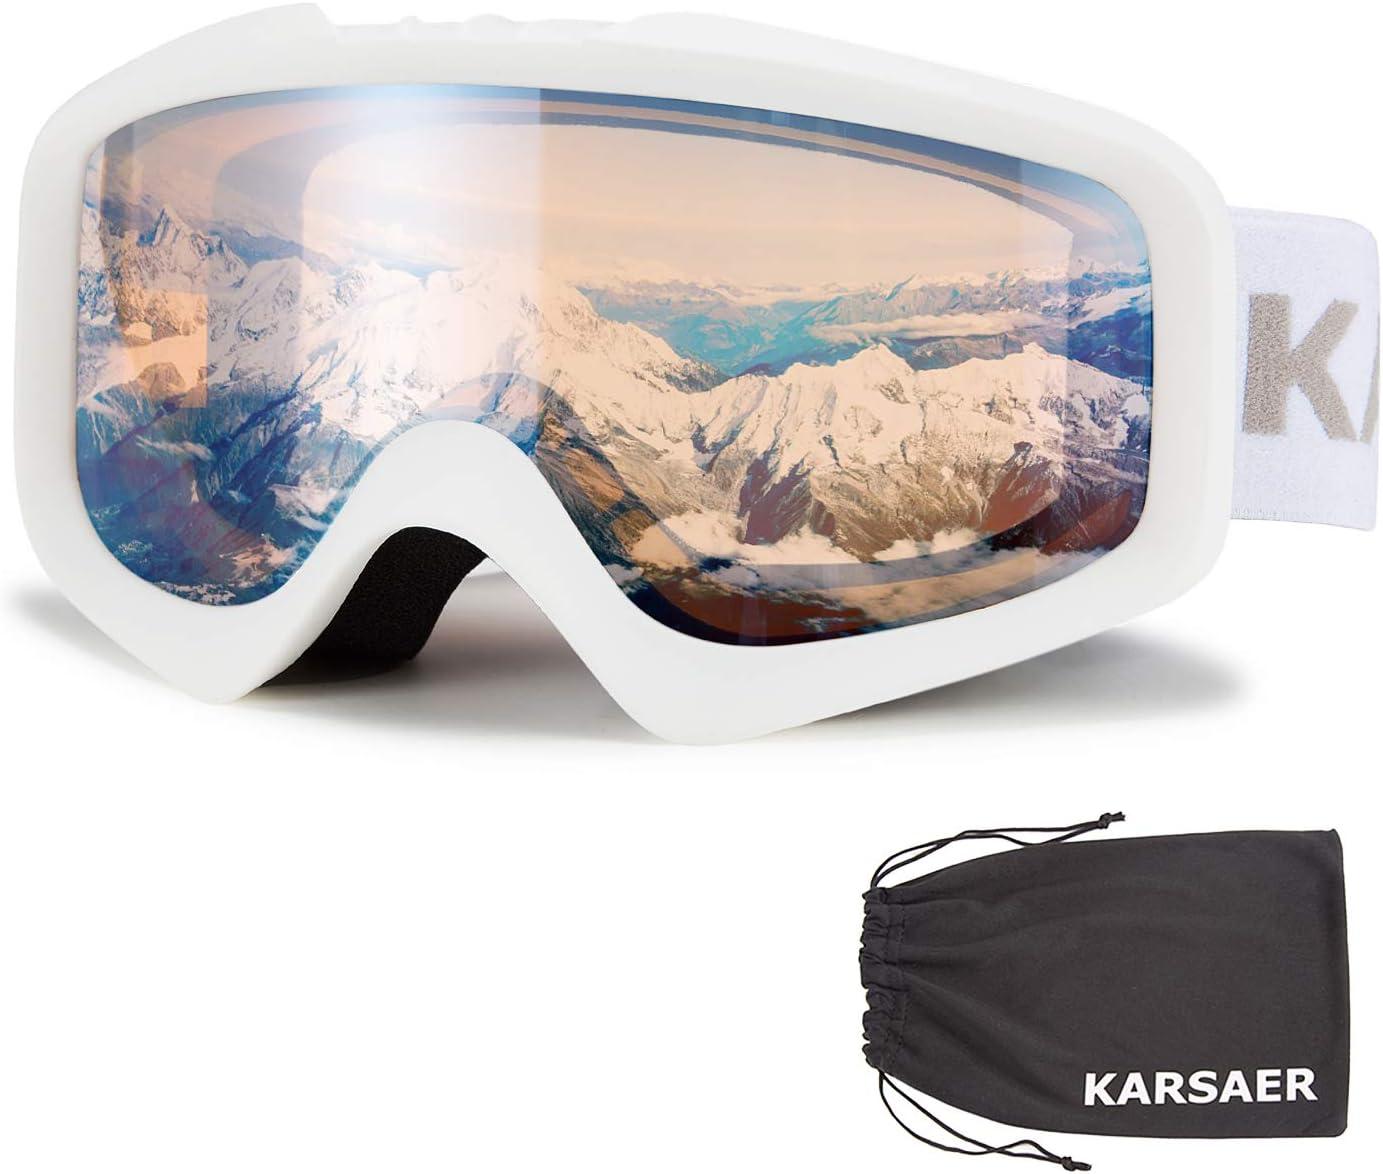 Karsaer Ski Goggles Anti-Fog Snowboard Goggles OTG 100 UV Protection Snow Goggles Bendable Dual-Lenses for Men Women Youth